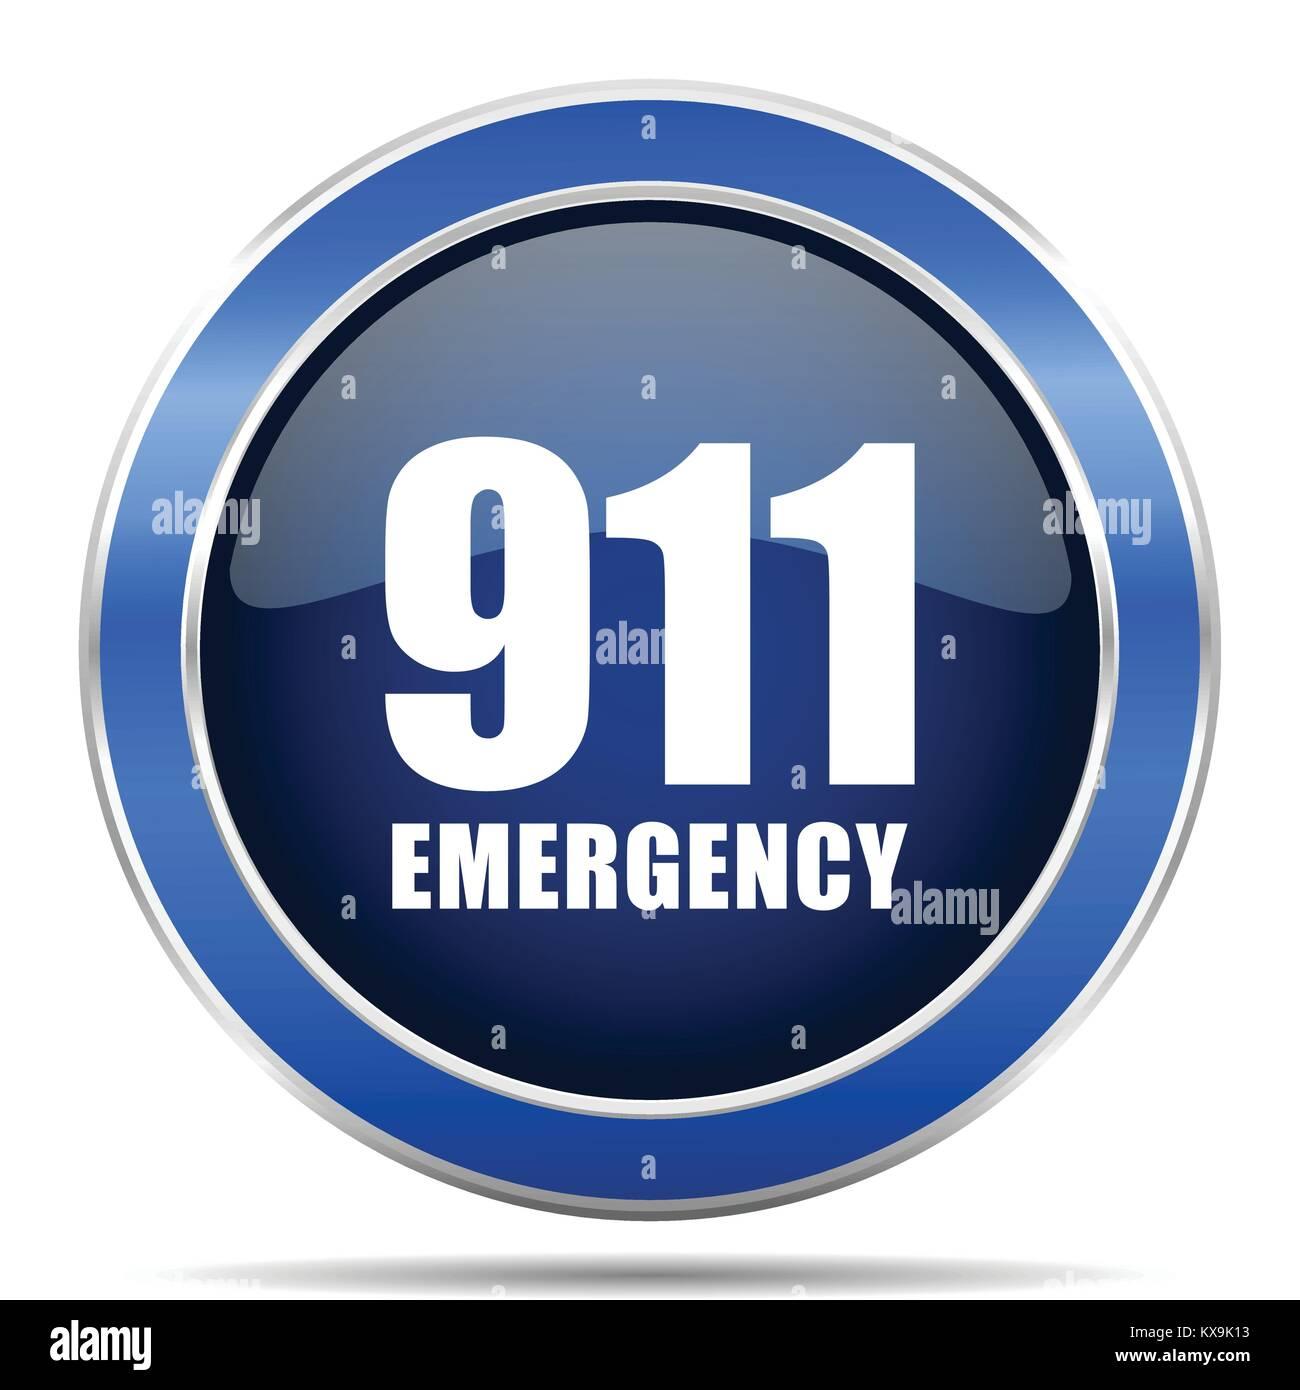 911 Emergency Logo Stock Photos Amp 911 Emergency Logo Stock